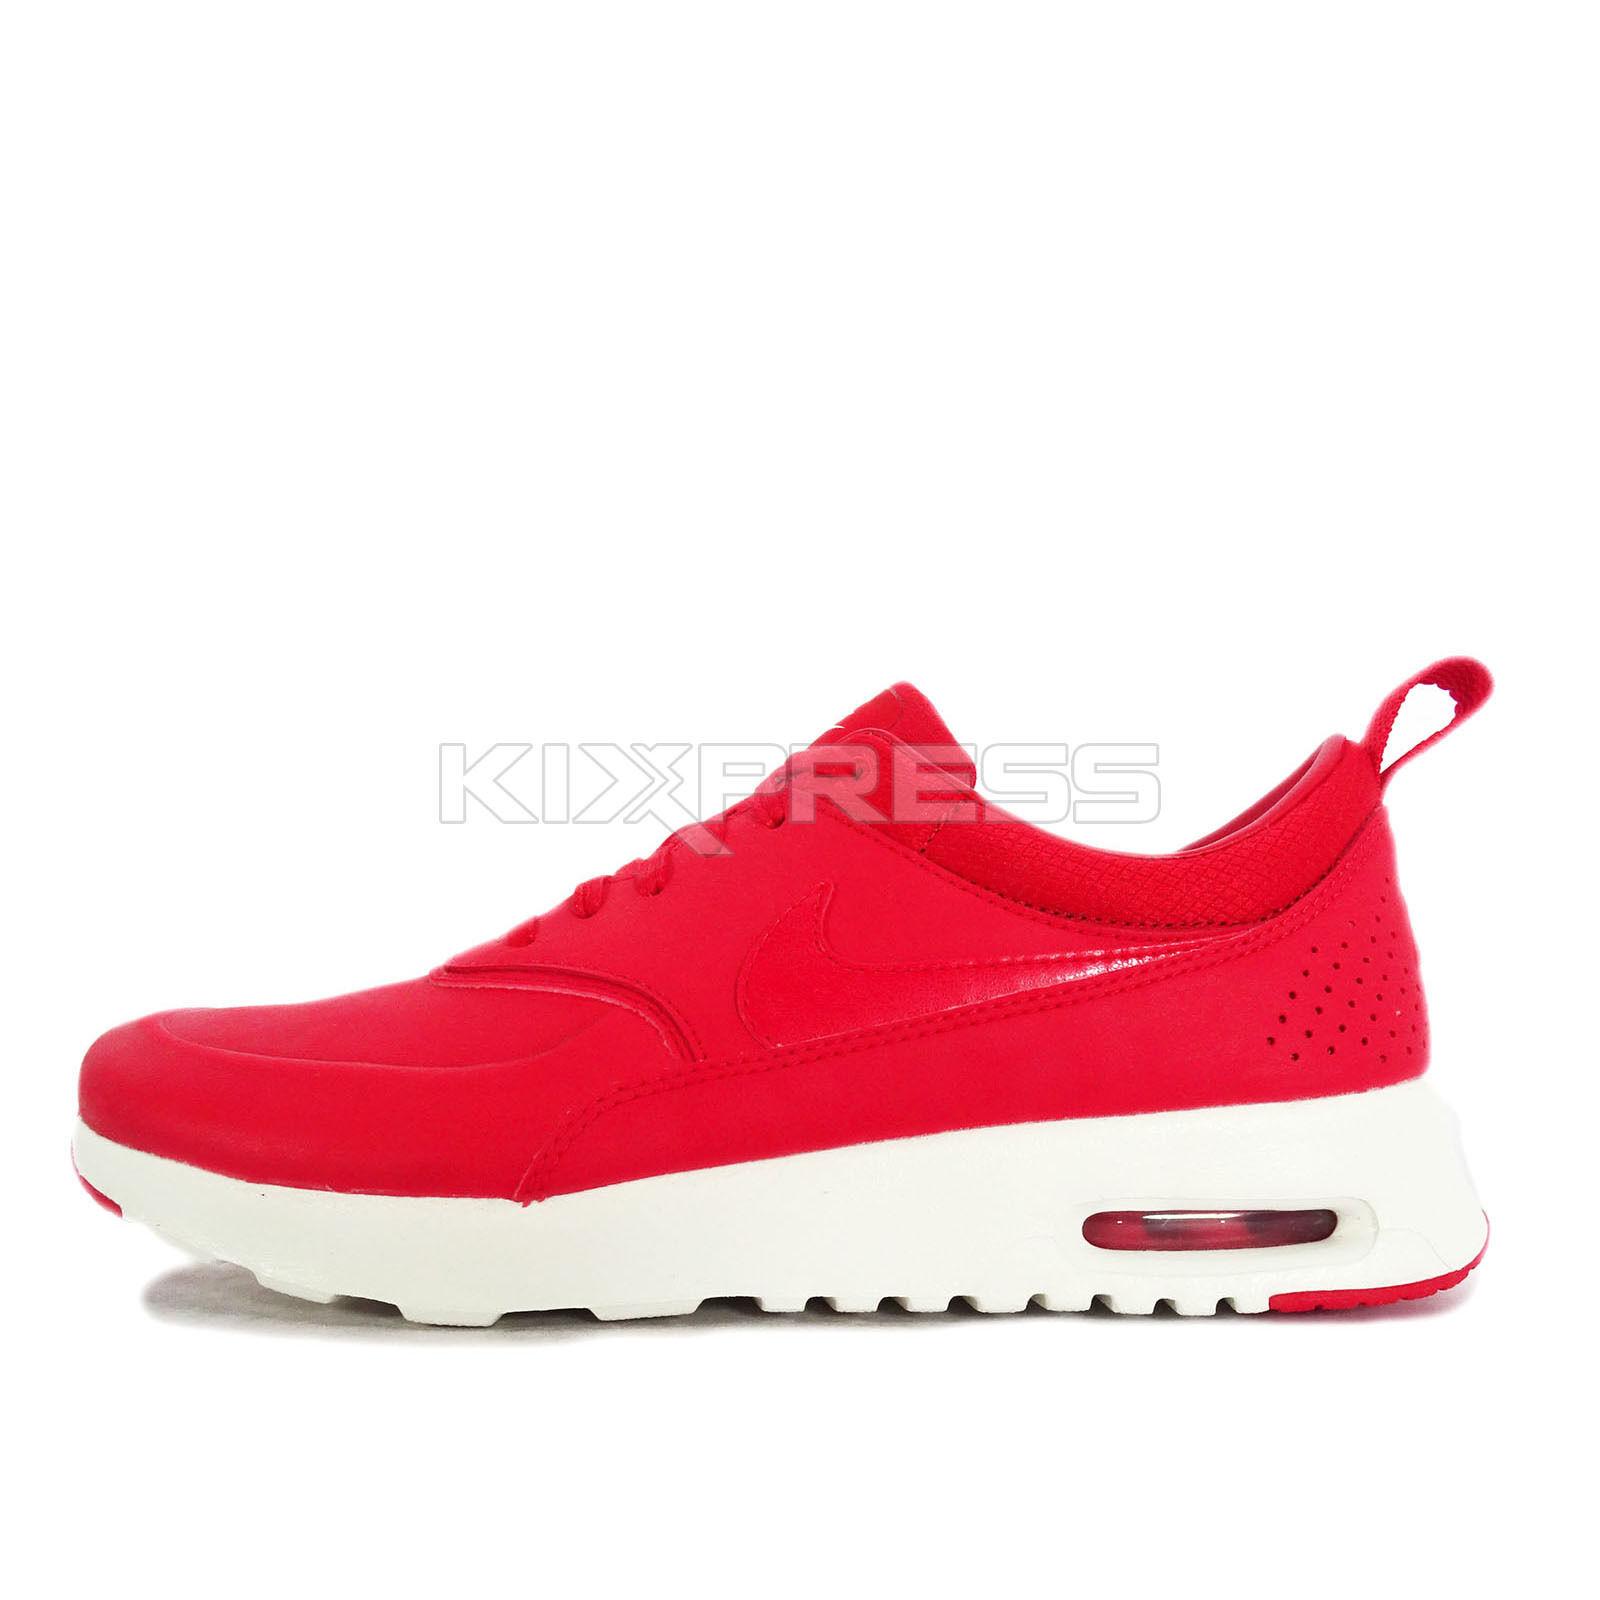 WMNS Nike Air Max Thea PRM [616723-602] NSW Casual Red/Sail-White